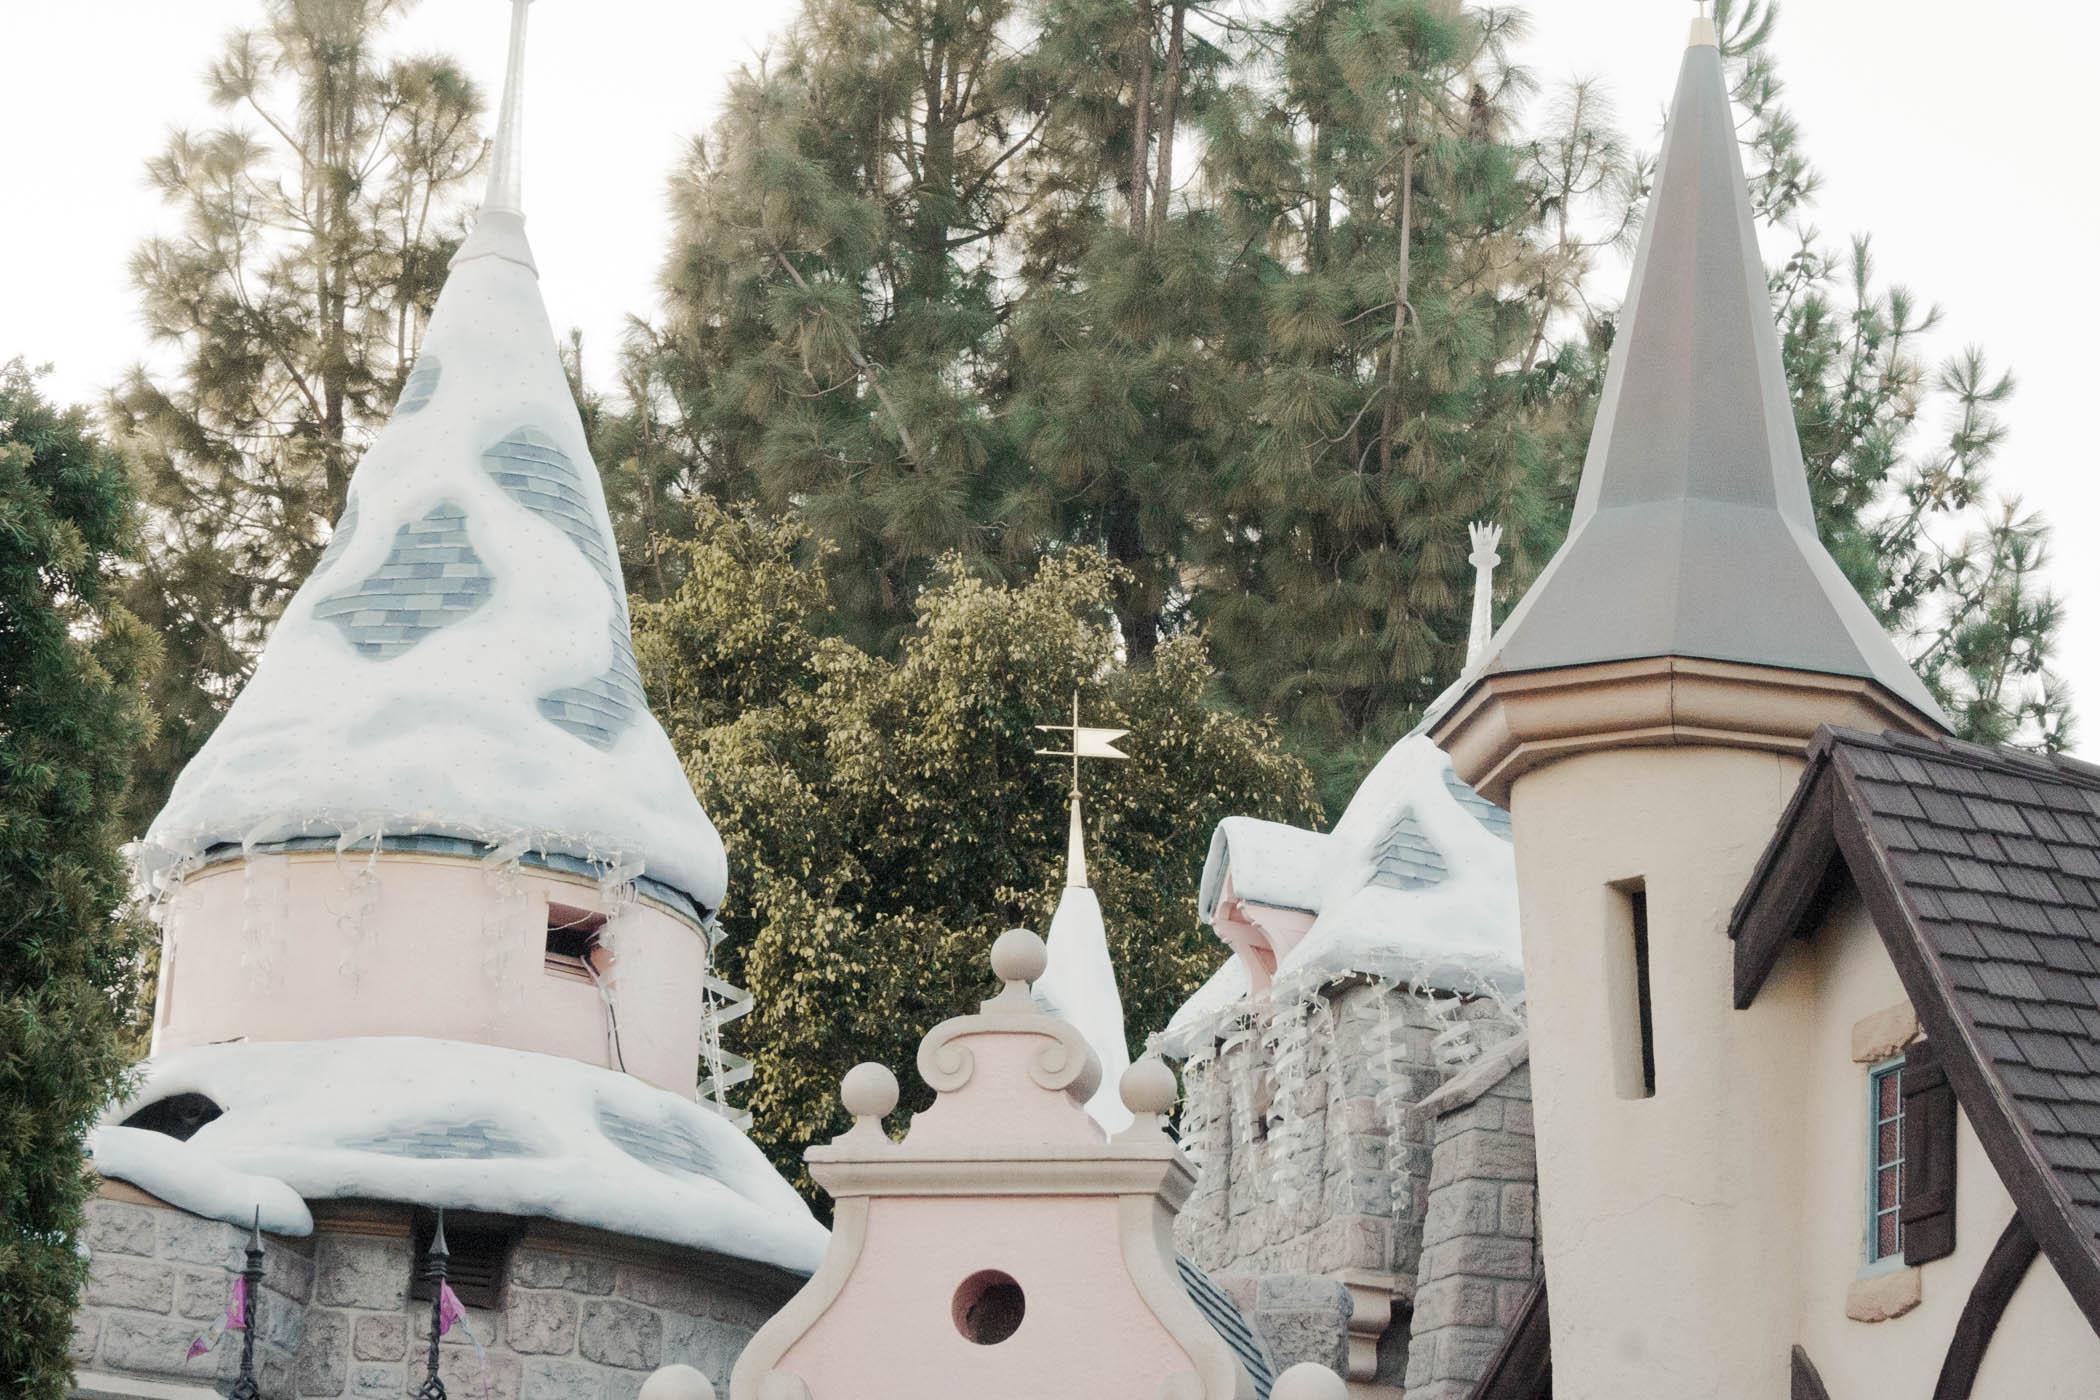 Disneyland2011_043.jpg